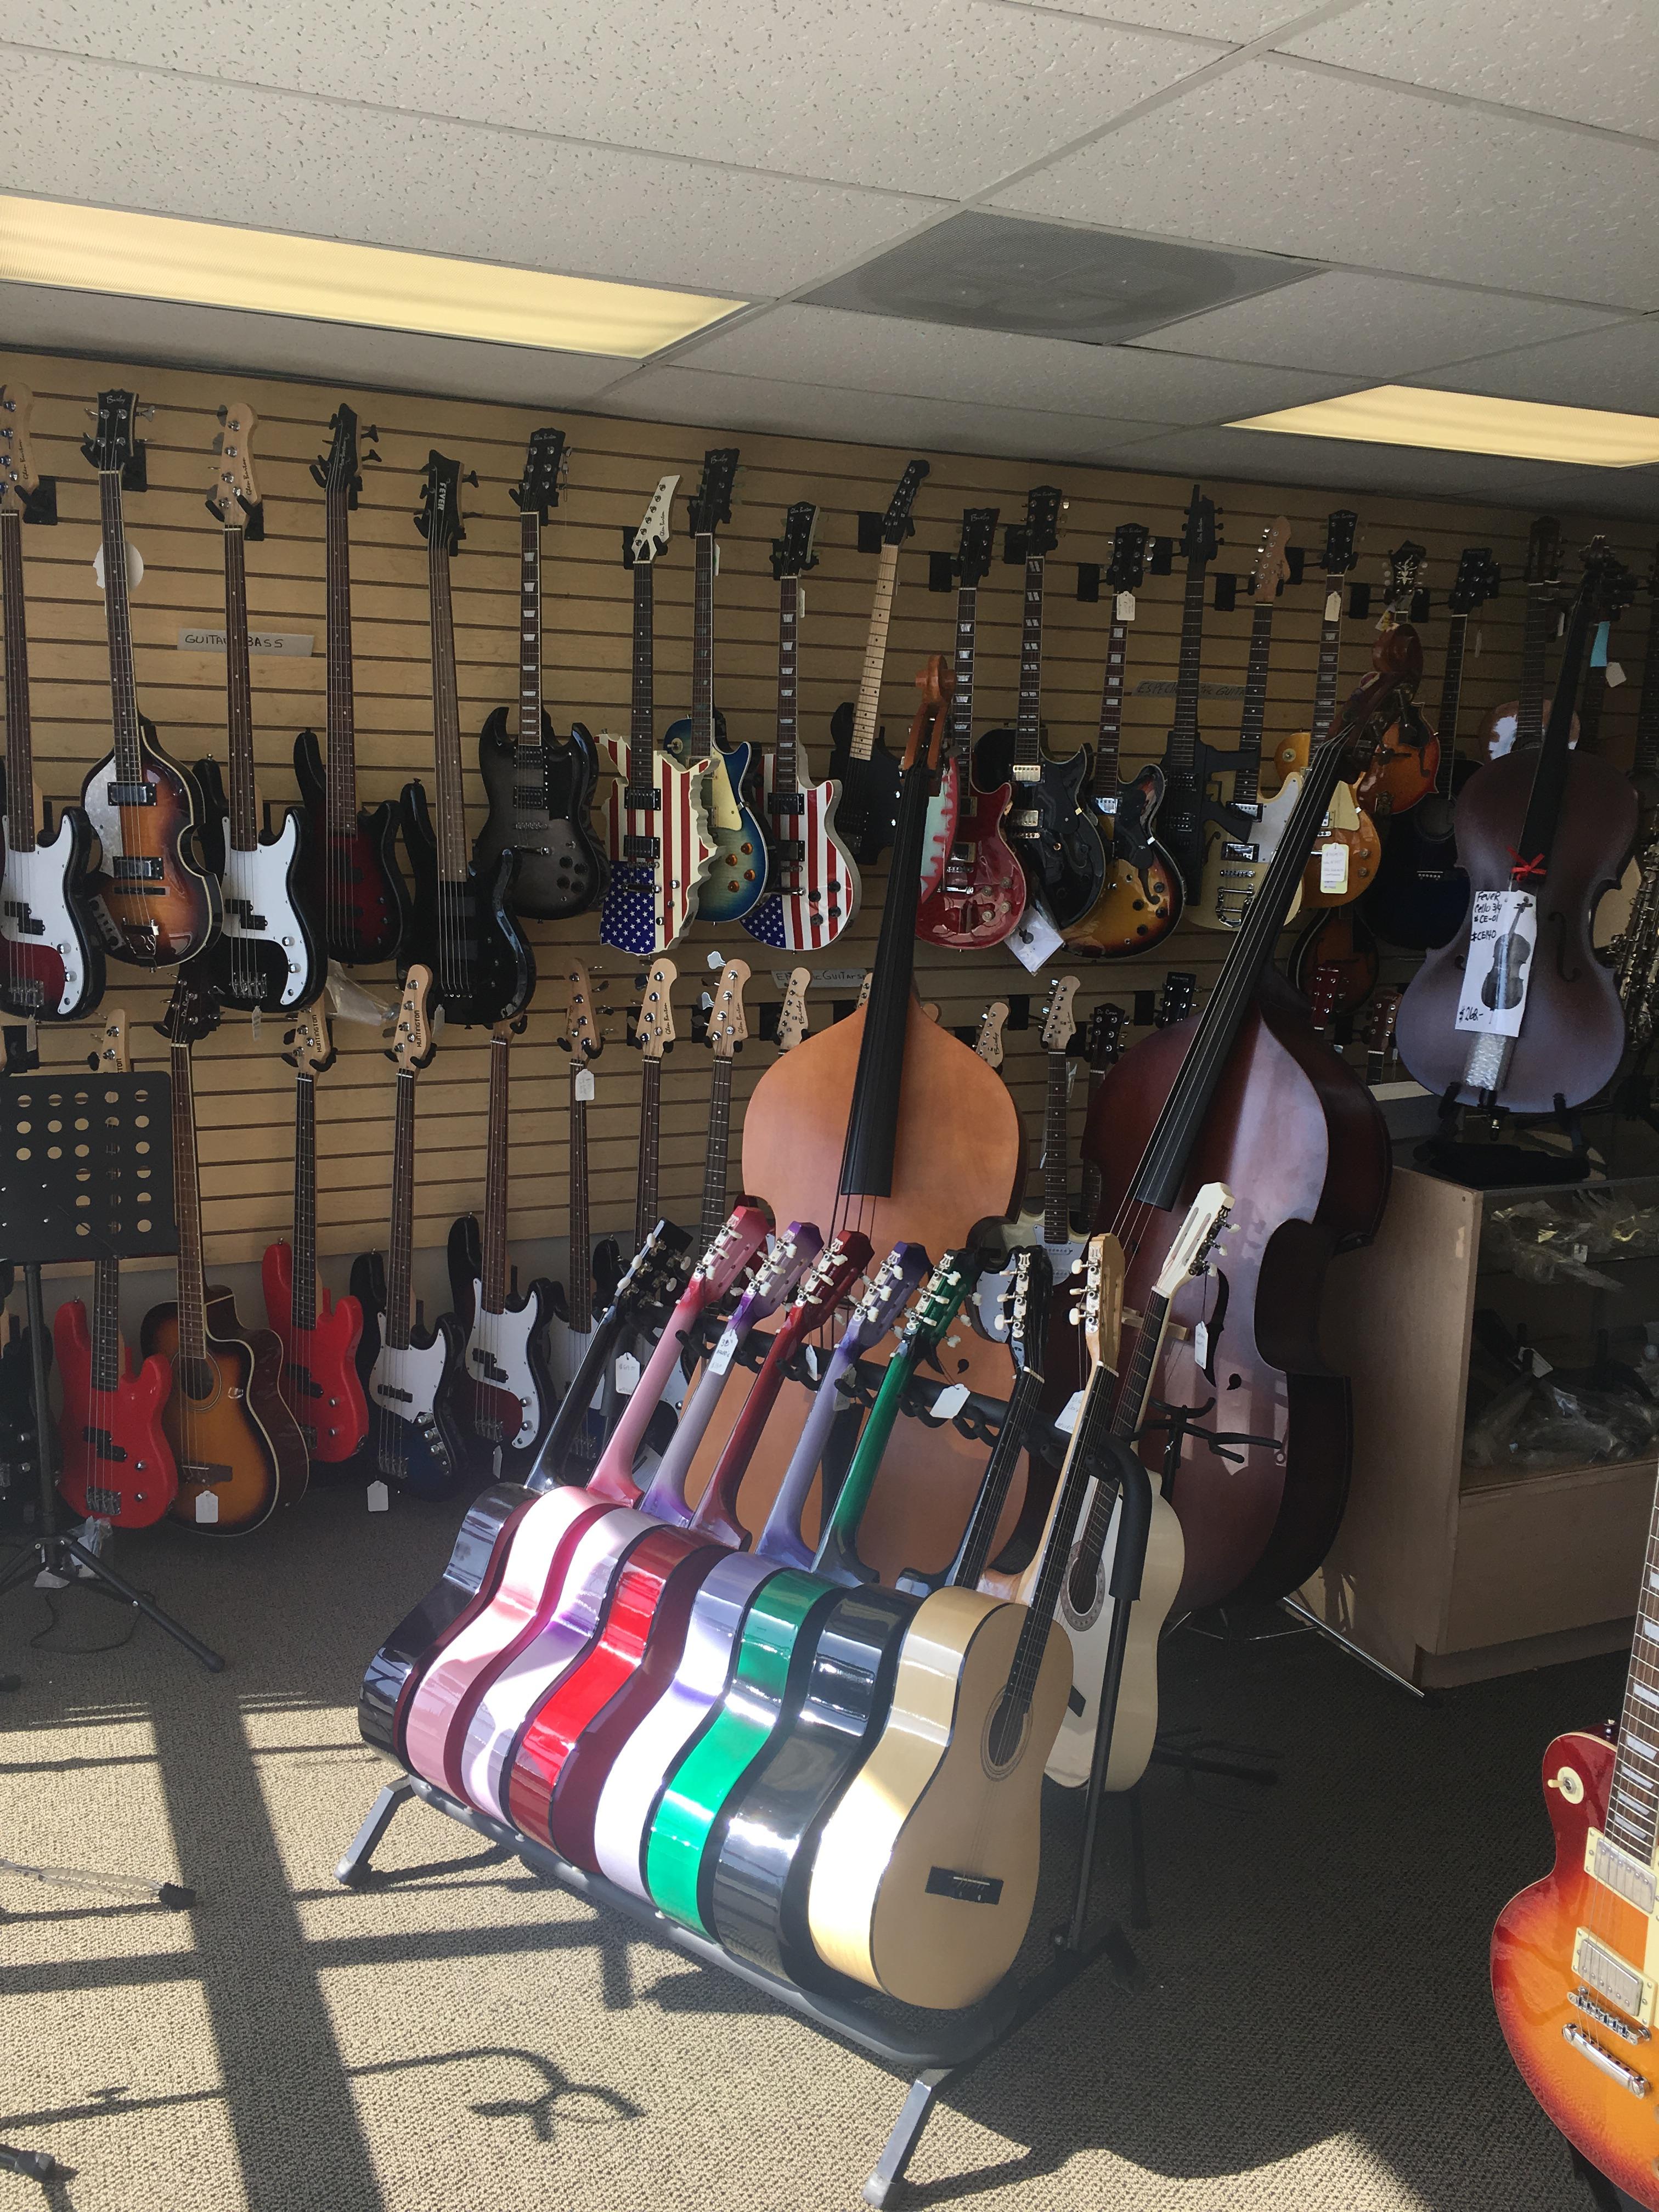 U.S. Music Store image 7